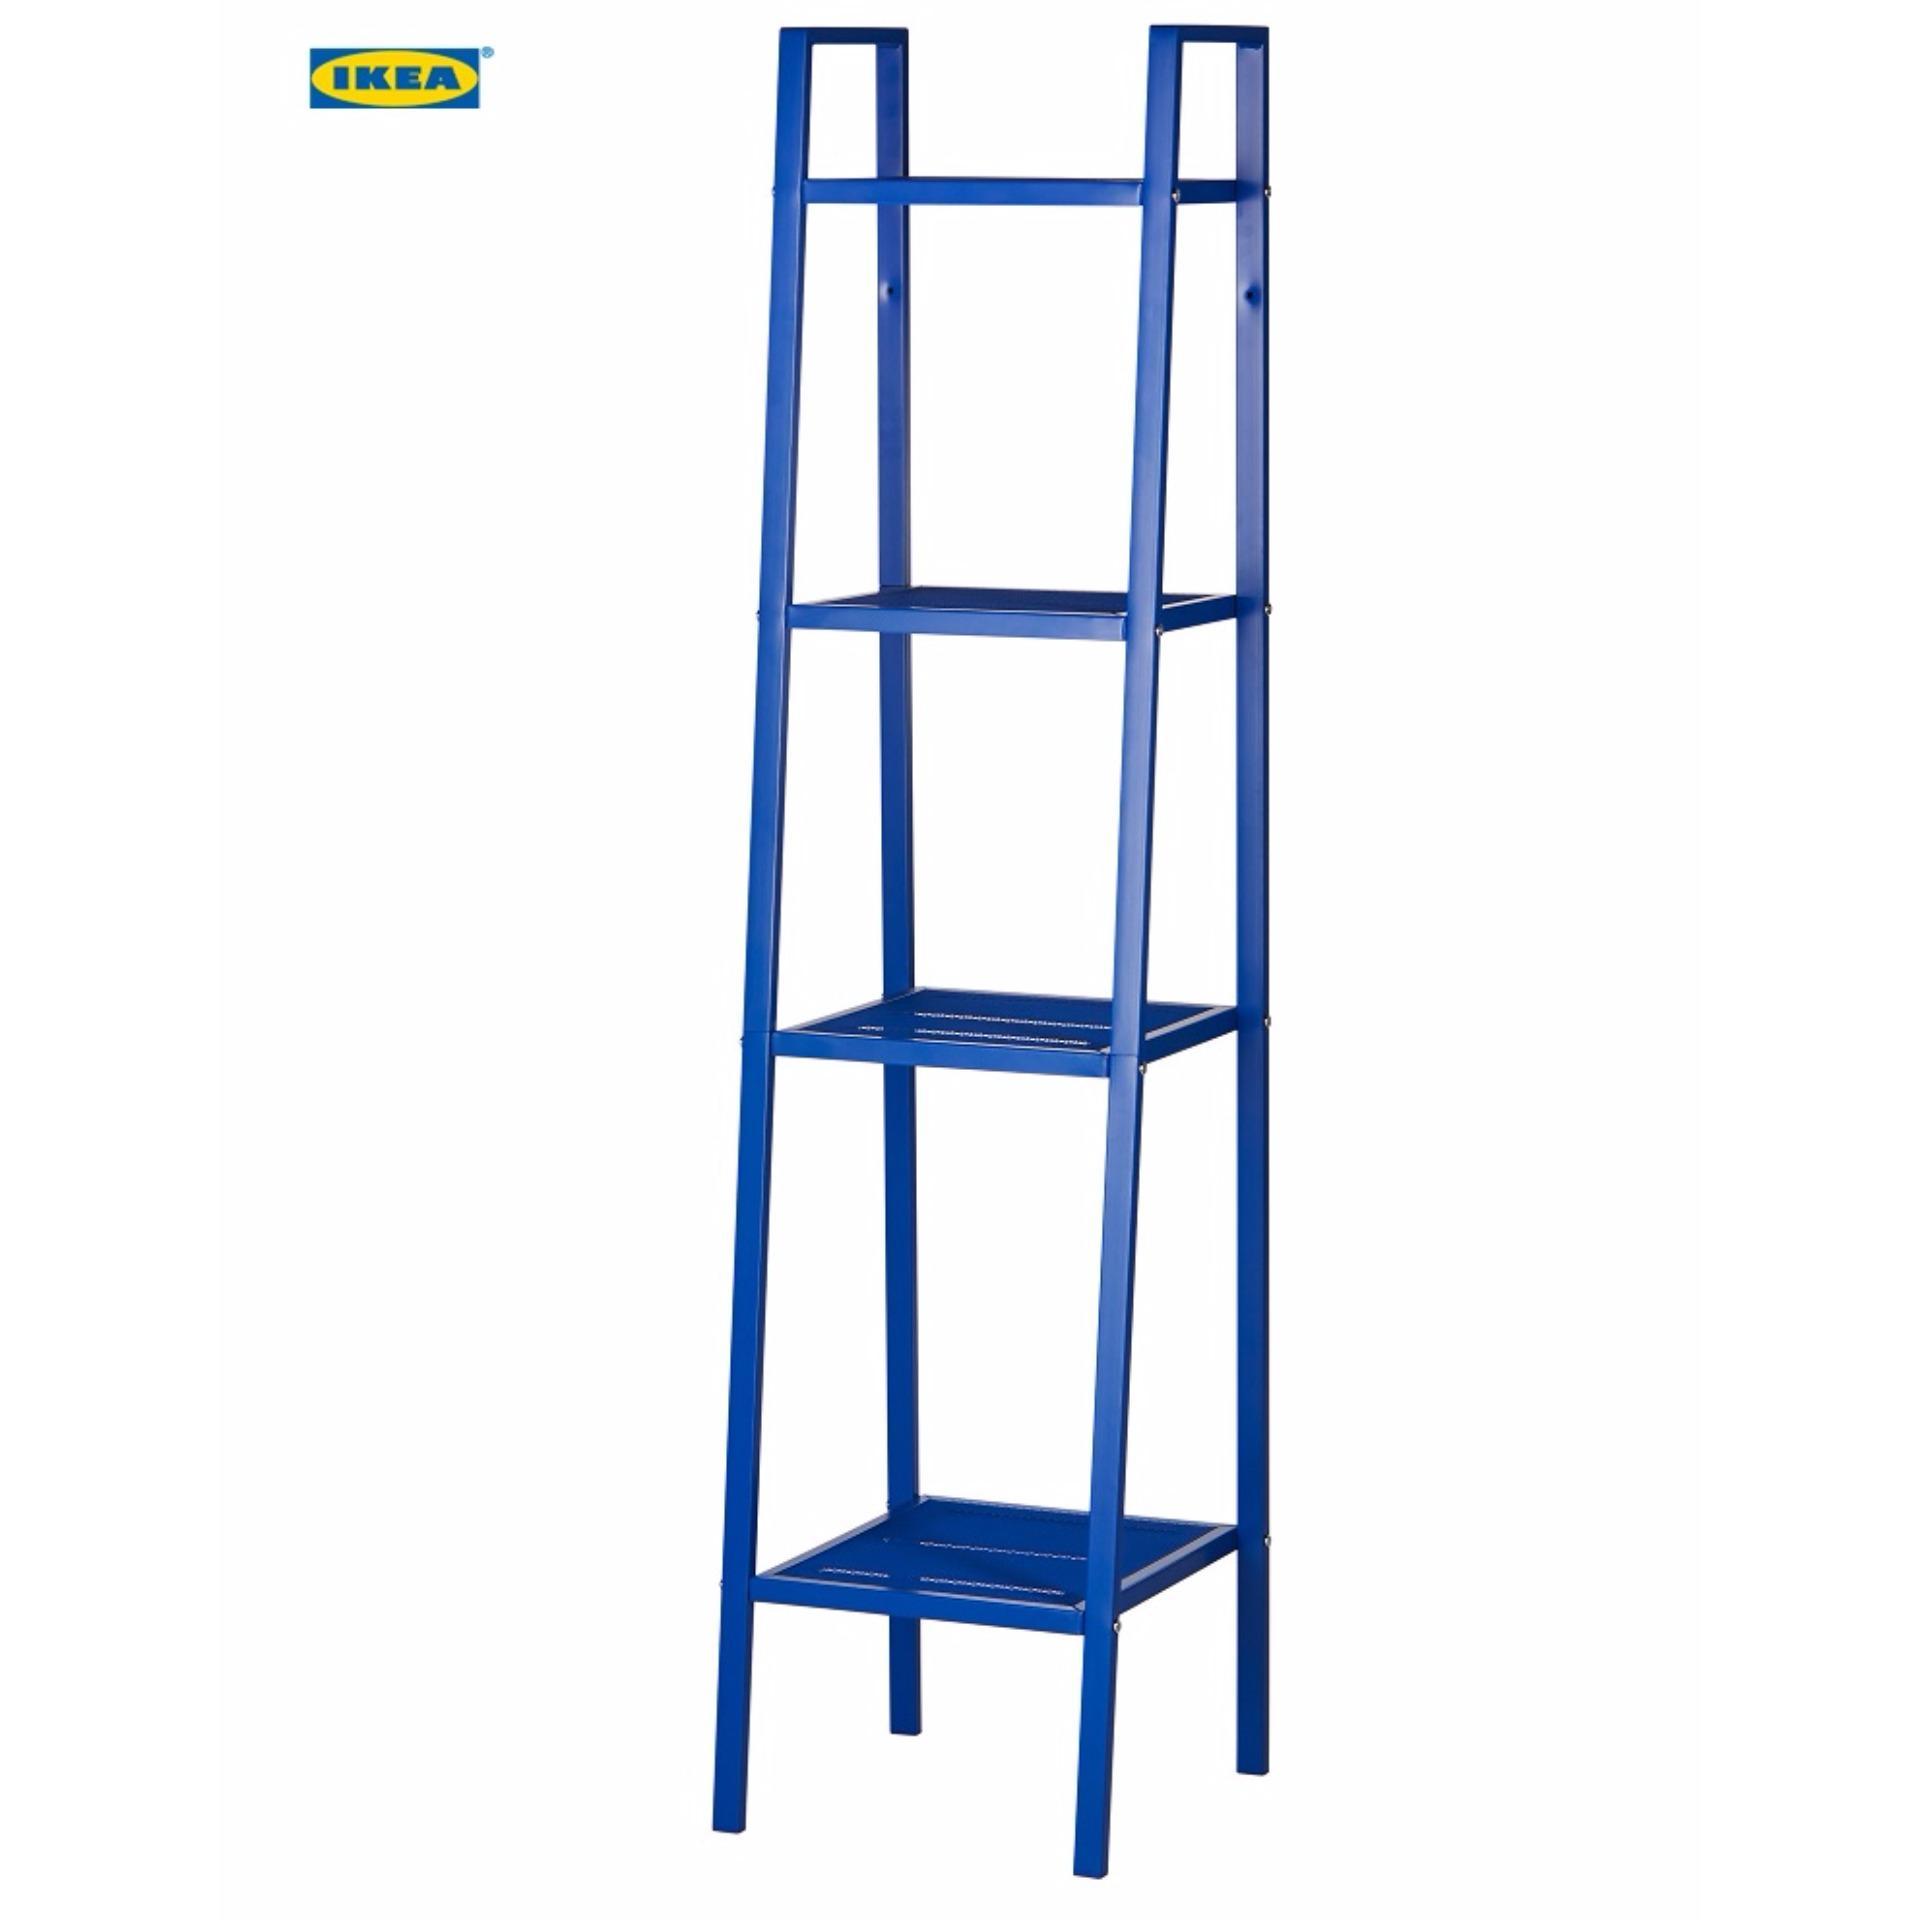 IKEA LERBERG Rak Besi MURAH KEREN 4 Shelving 35 x 148 Cm / Rak Buku / Rak Serbaguna / Rak Besi Baja